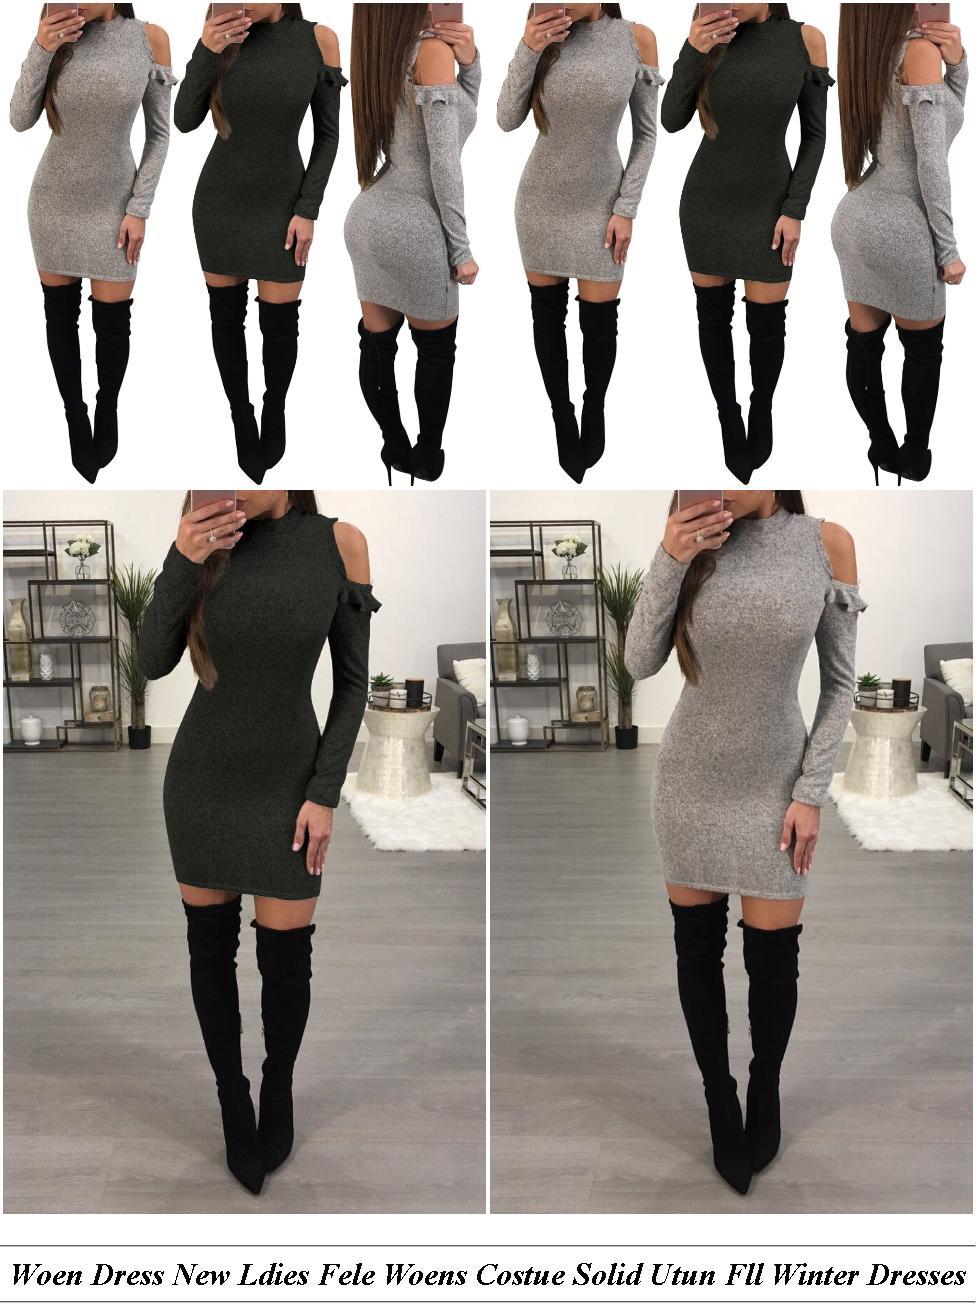 Sequin Dress Mini Long Sleeve - Vintage Clothes Near Me - Elegant Evening Dresses For The Fuller Figure